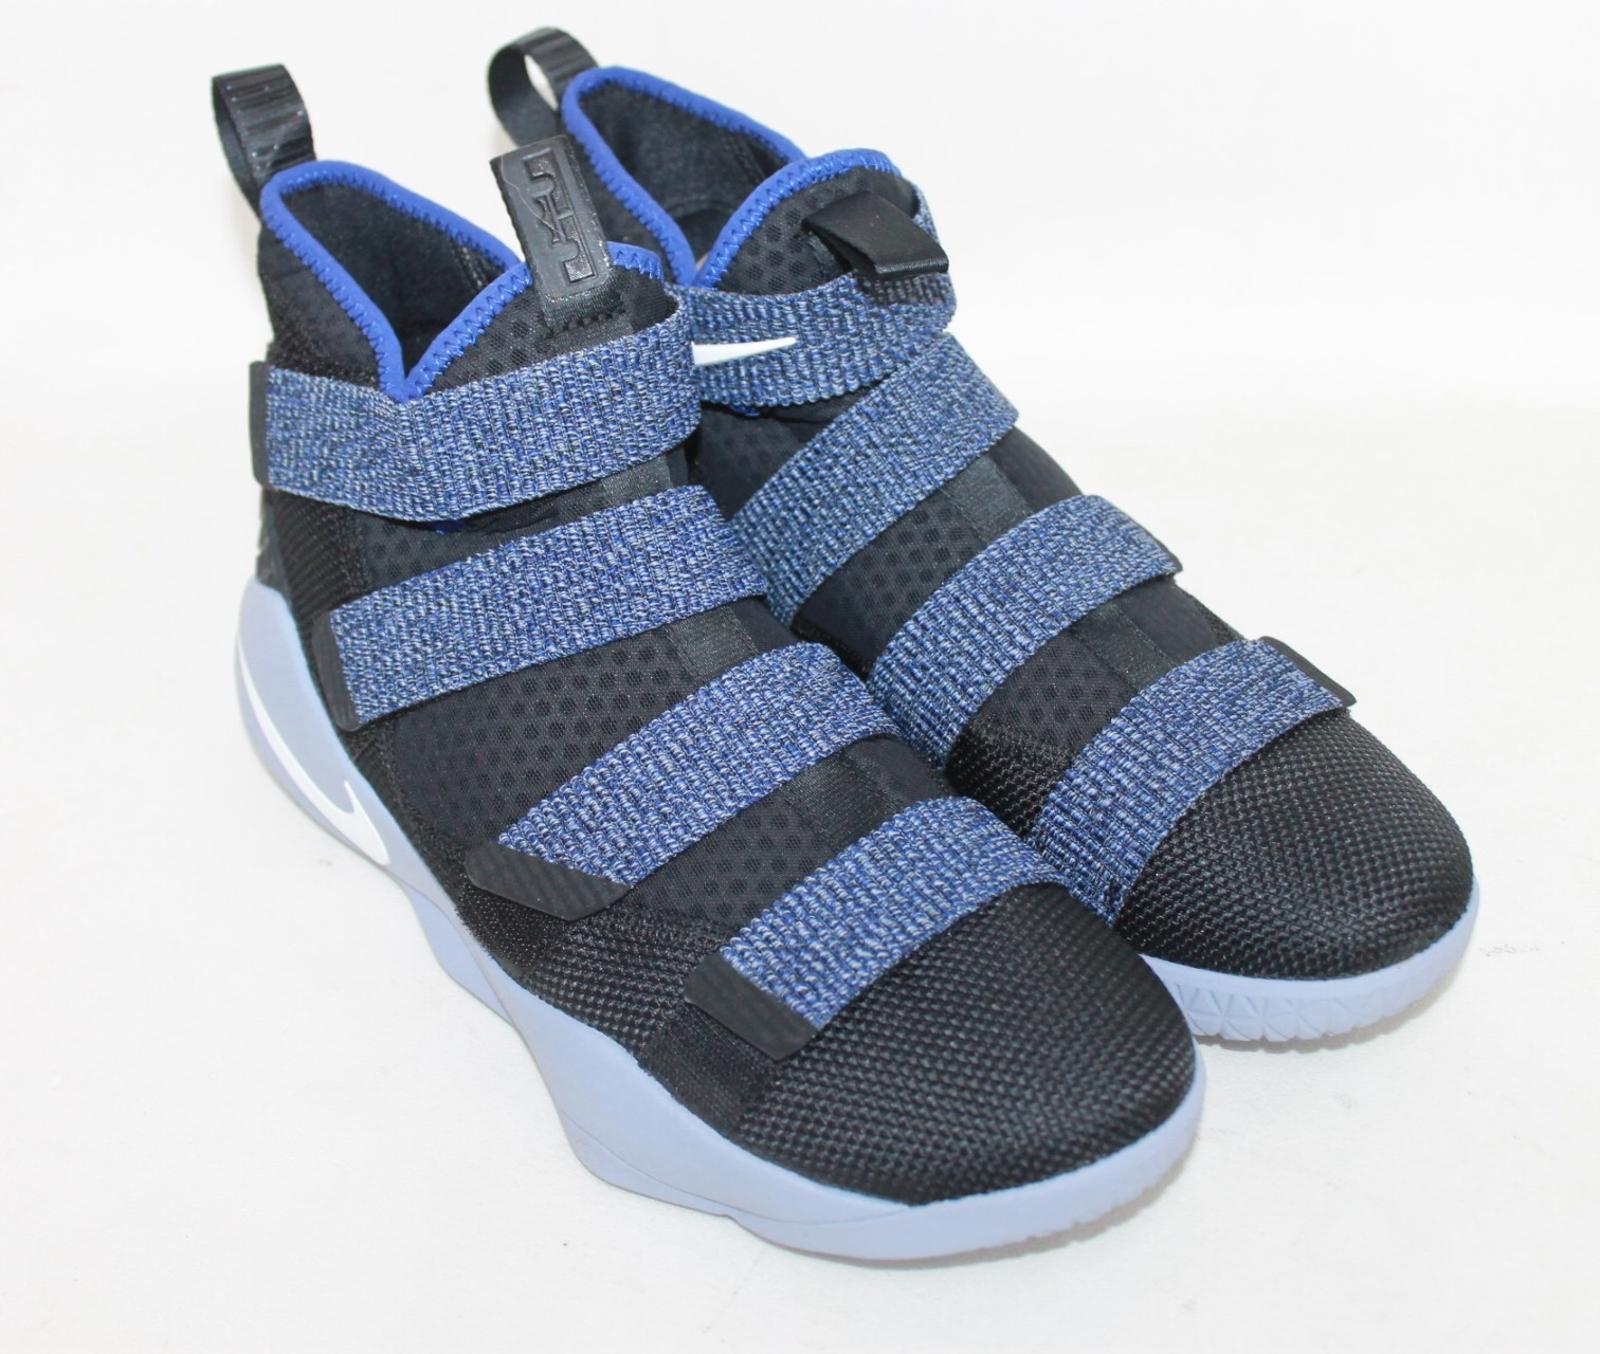 taille Eu44 Nouveau Uk9 5 Lebron basket Soldier Nike 5 de Zoom Xi Chaussures Bottes ball ffHwq